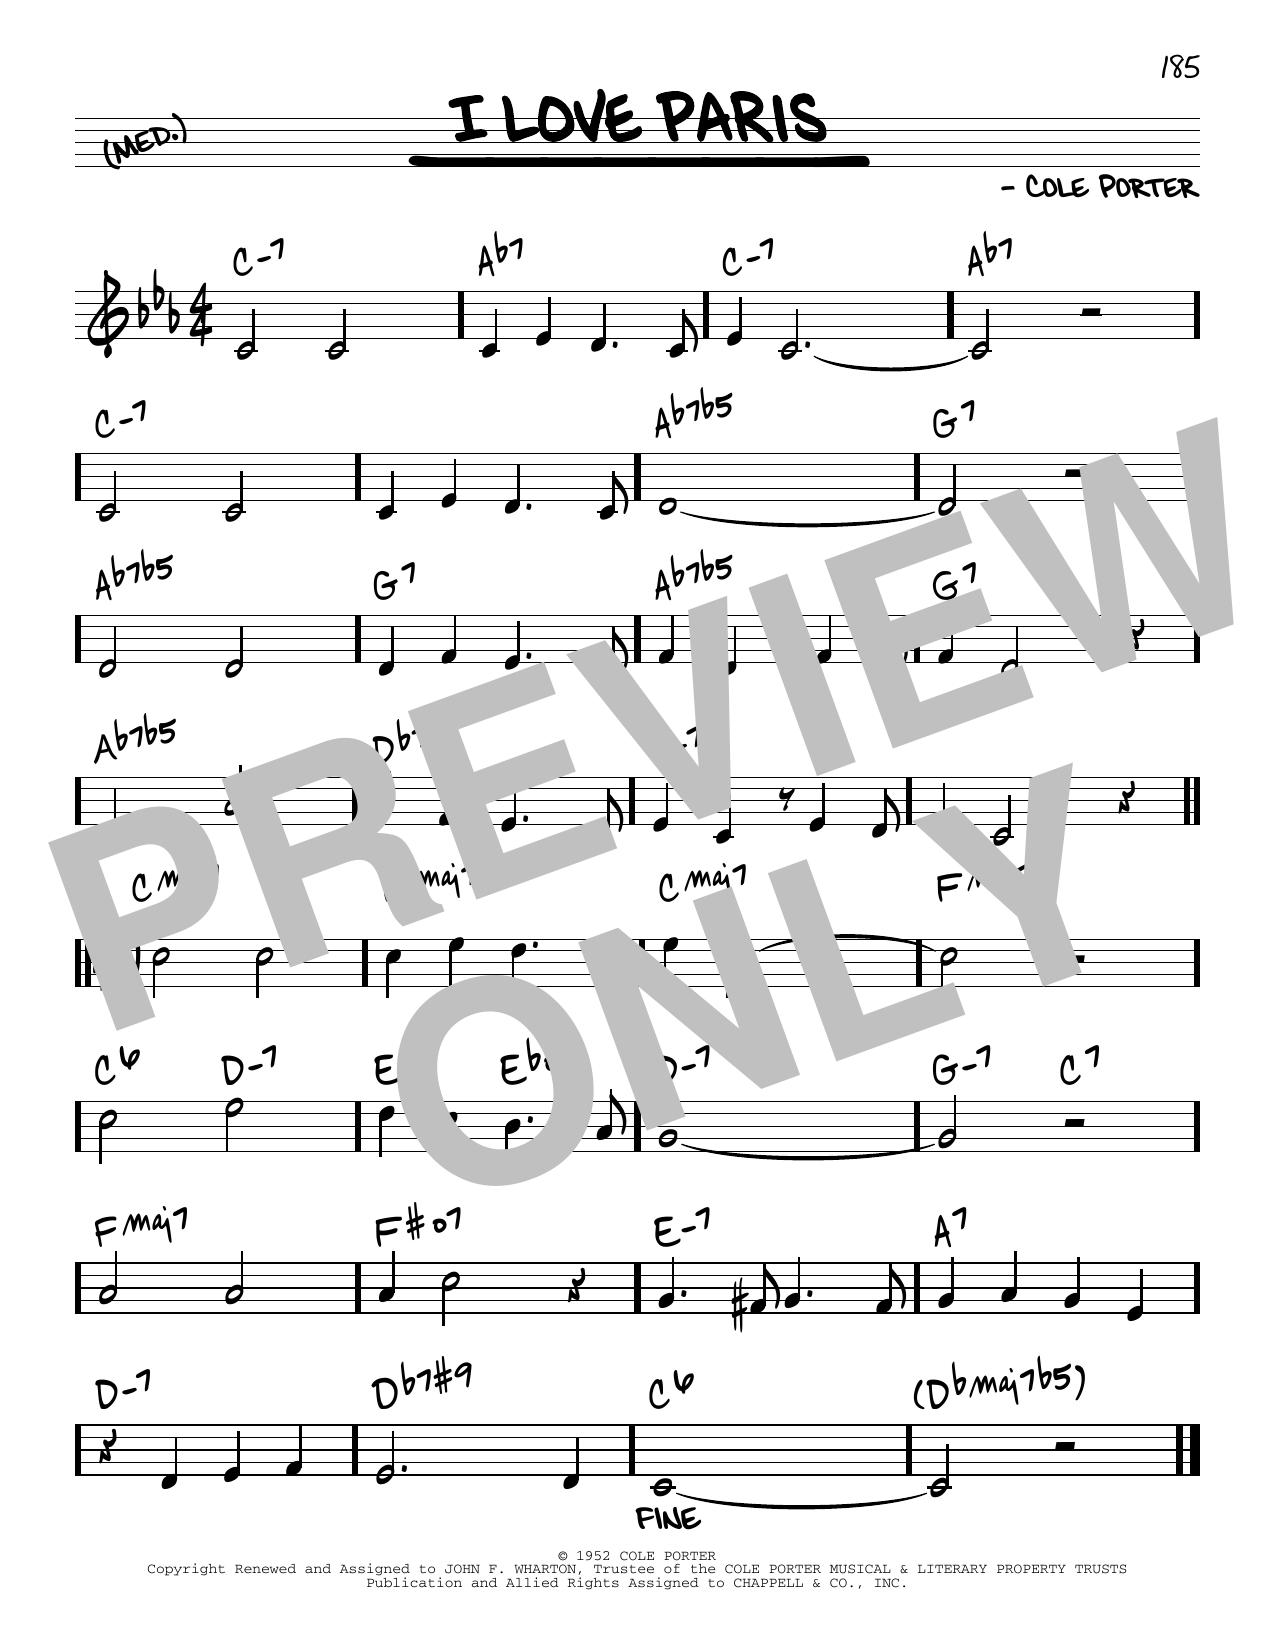 Cole Porter I Love Paris [Reharmonized version] (arr. Jack Grassel) sheet music notes printable PDF score